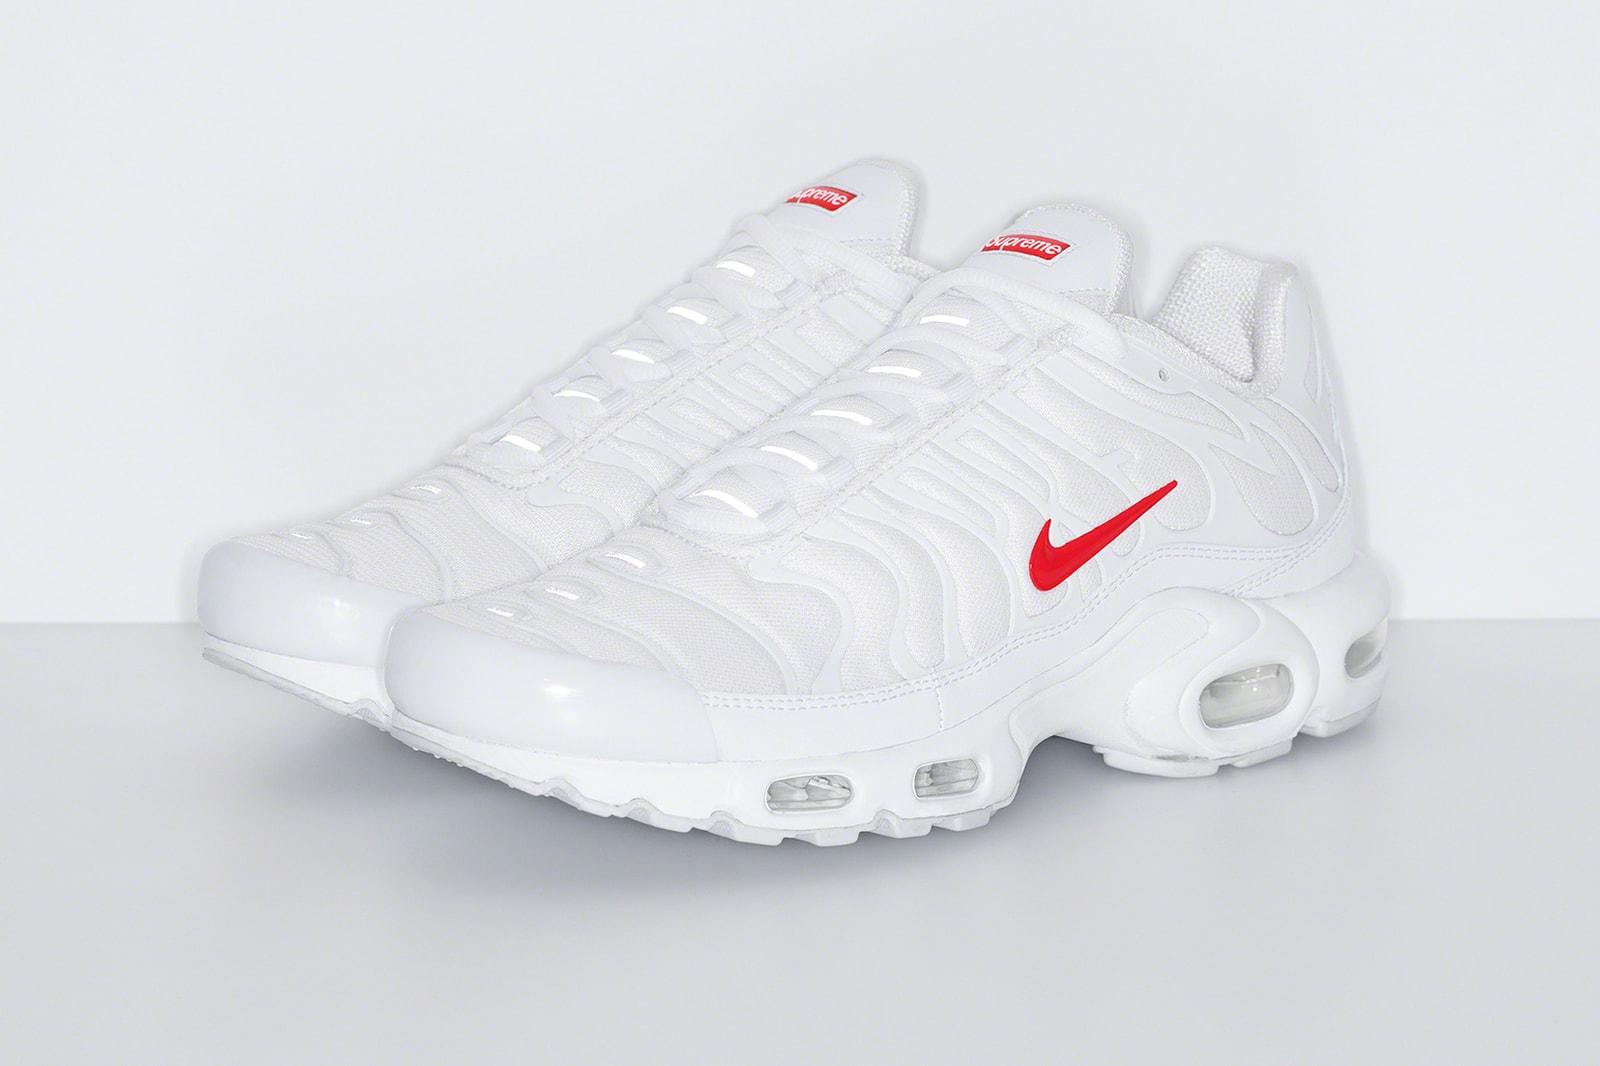 Supreme x Nike Air Max Plus 2020 秋冬系列聯名鞋款正式發佈